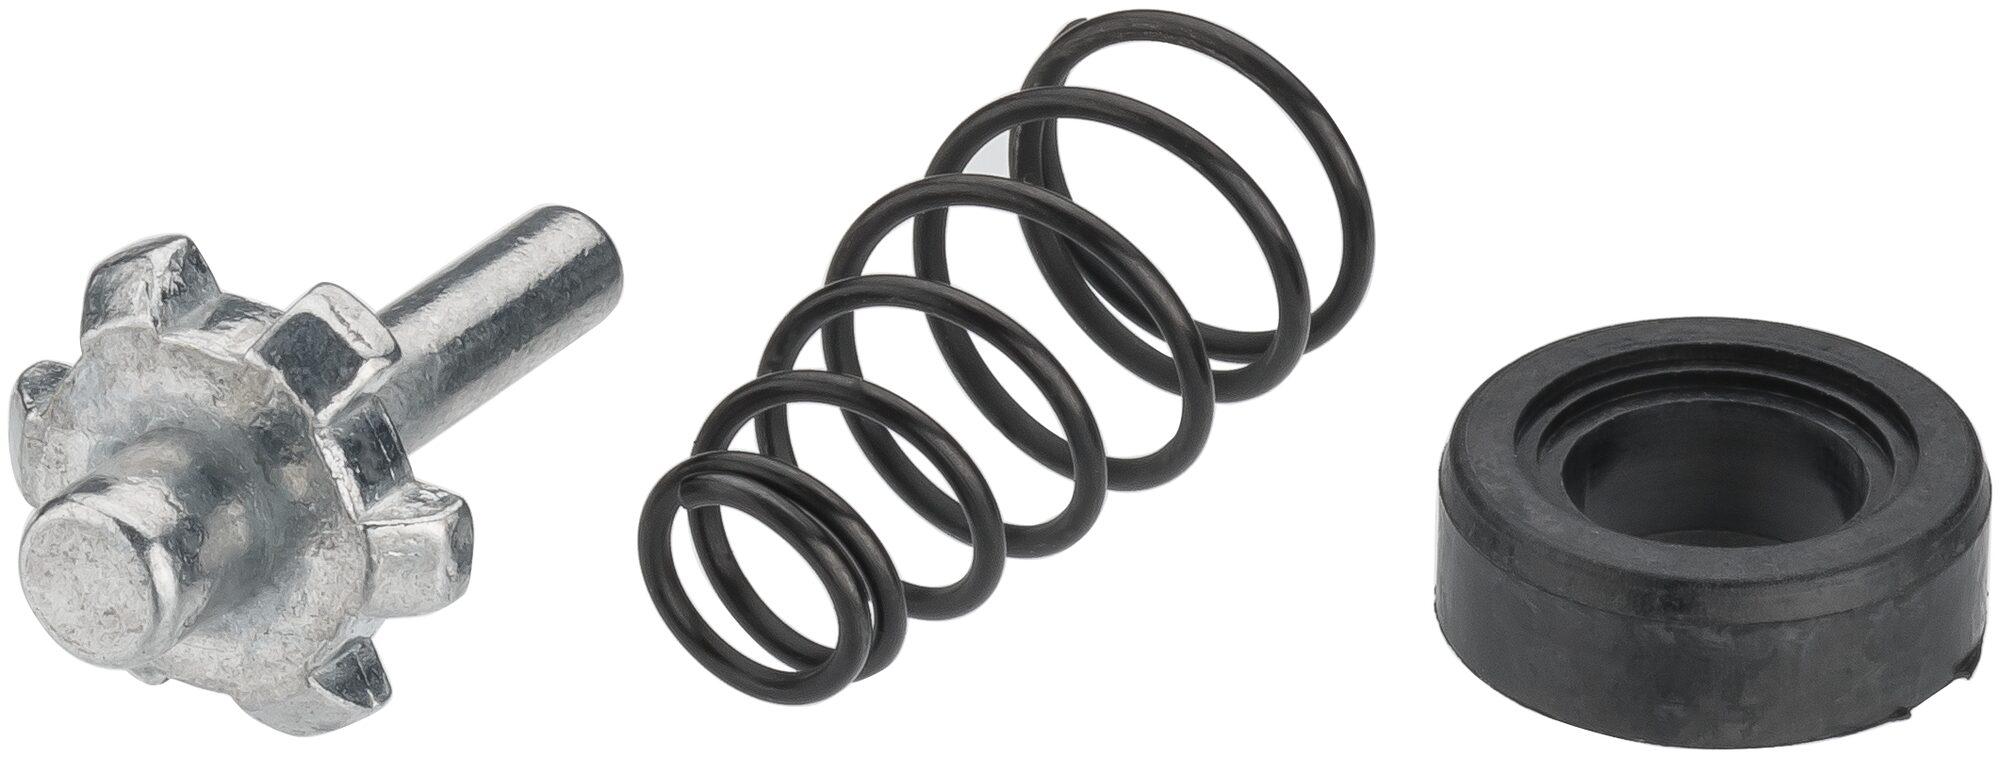 HAZET Ventil-Schaft 9033N-7-06/3